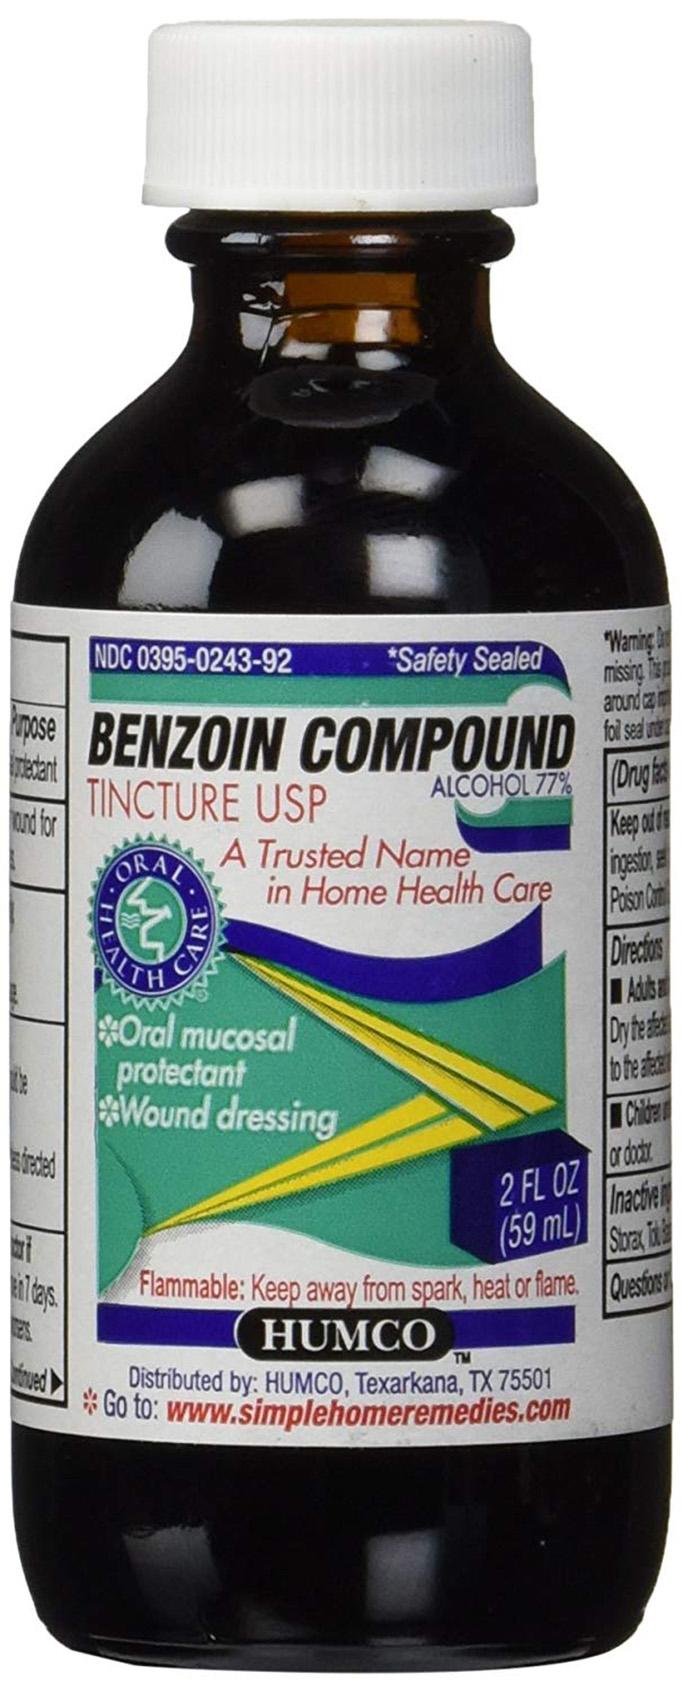 benzoin compound, canker sore